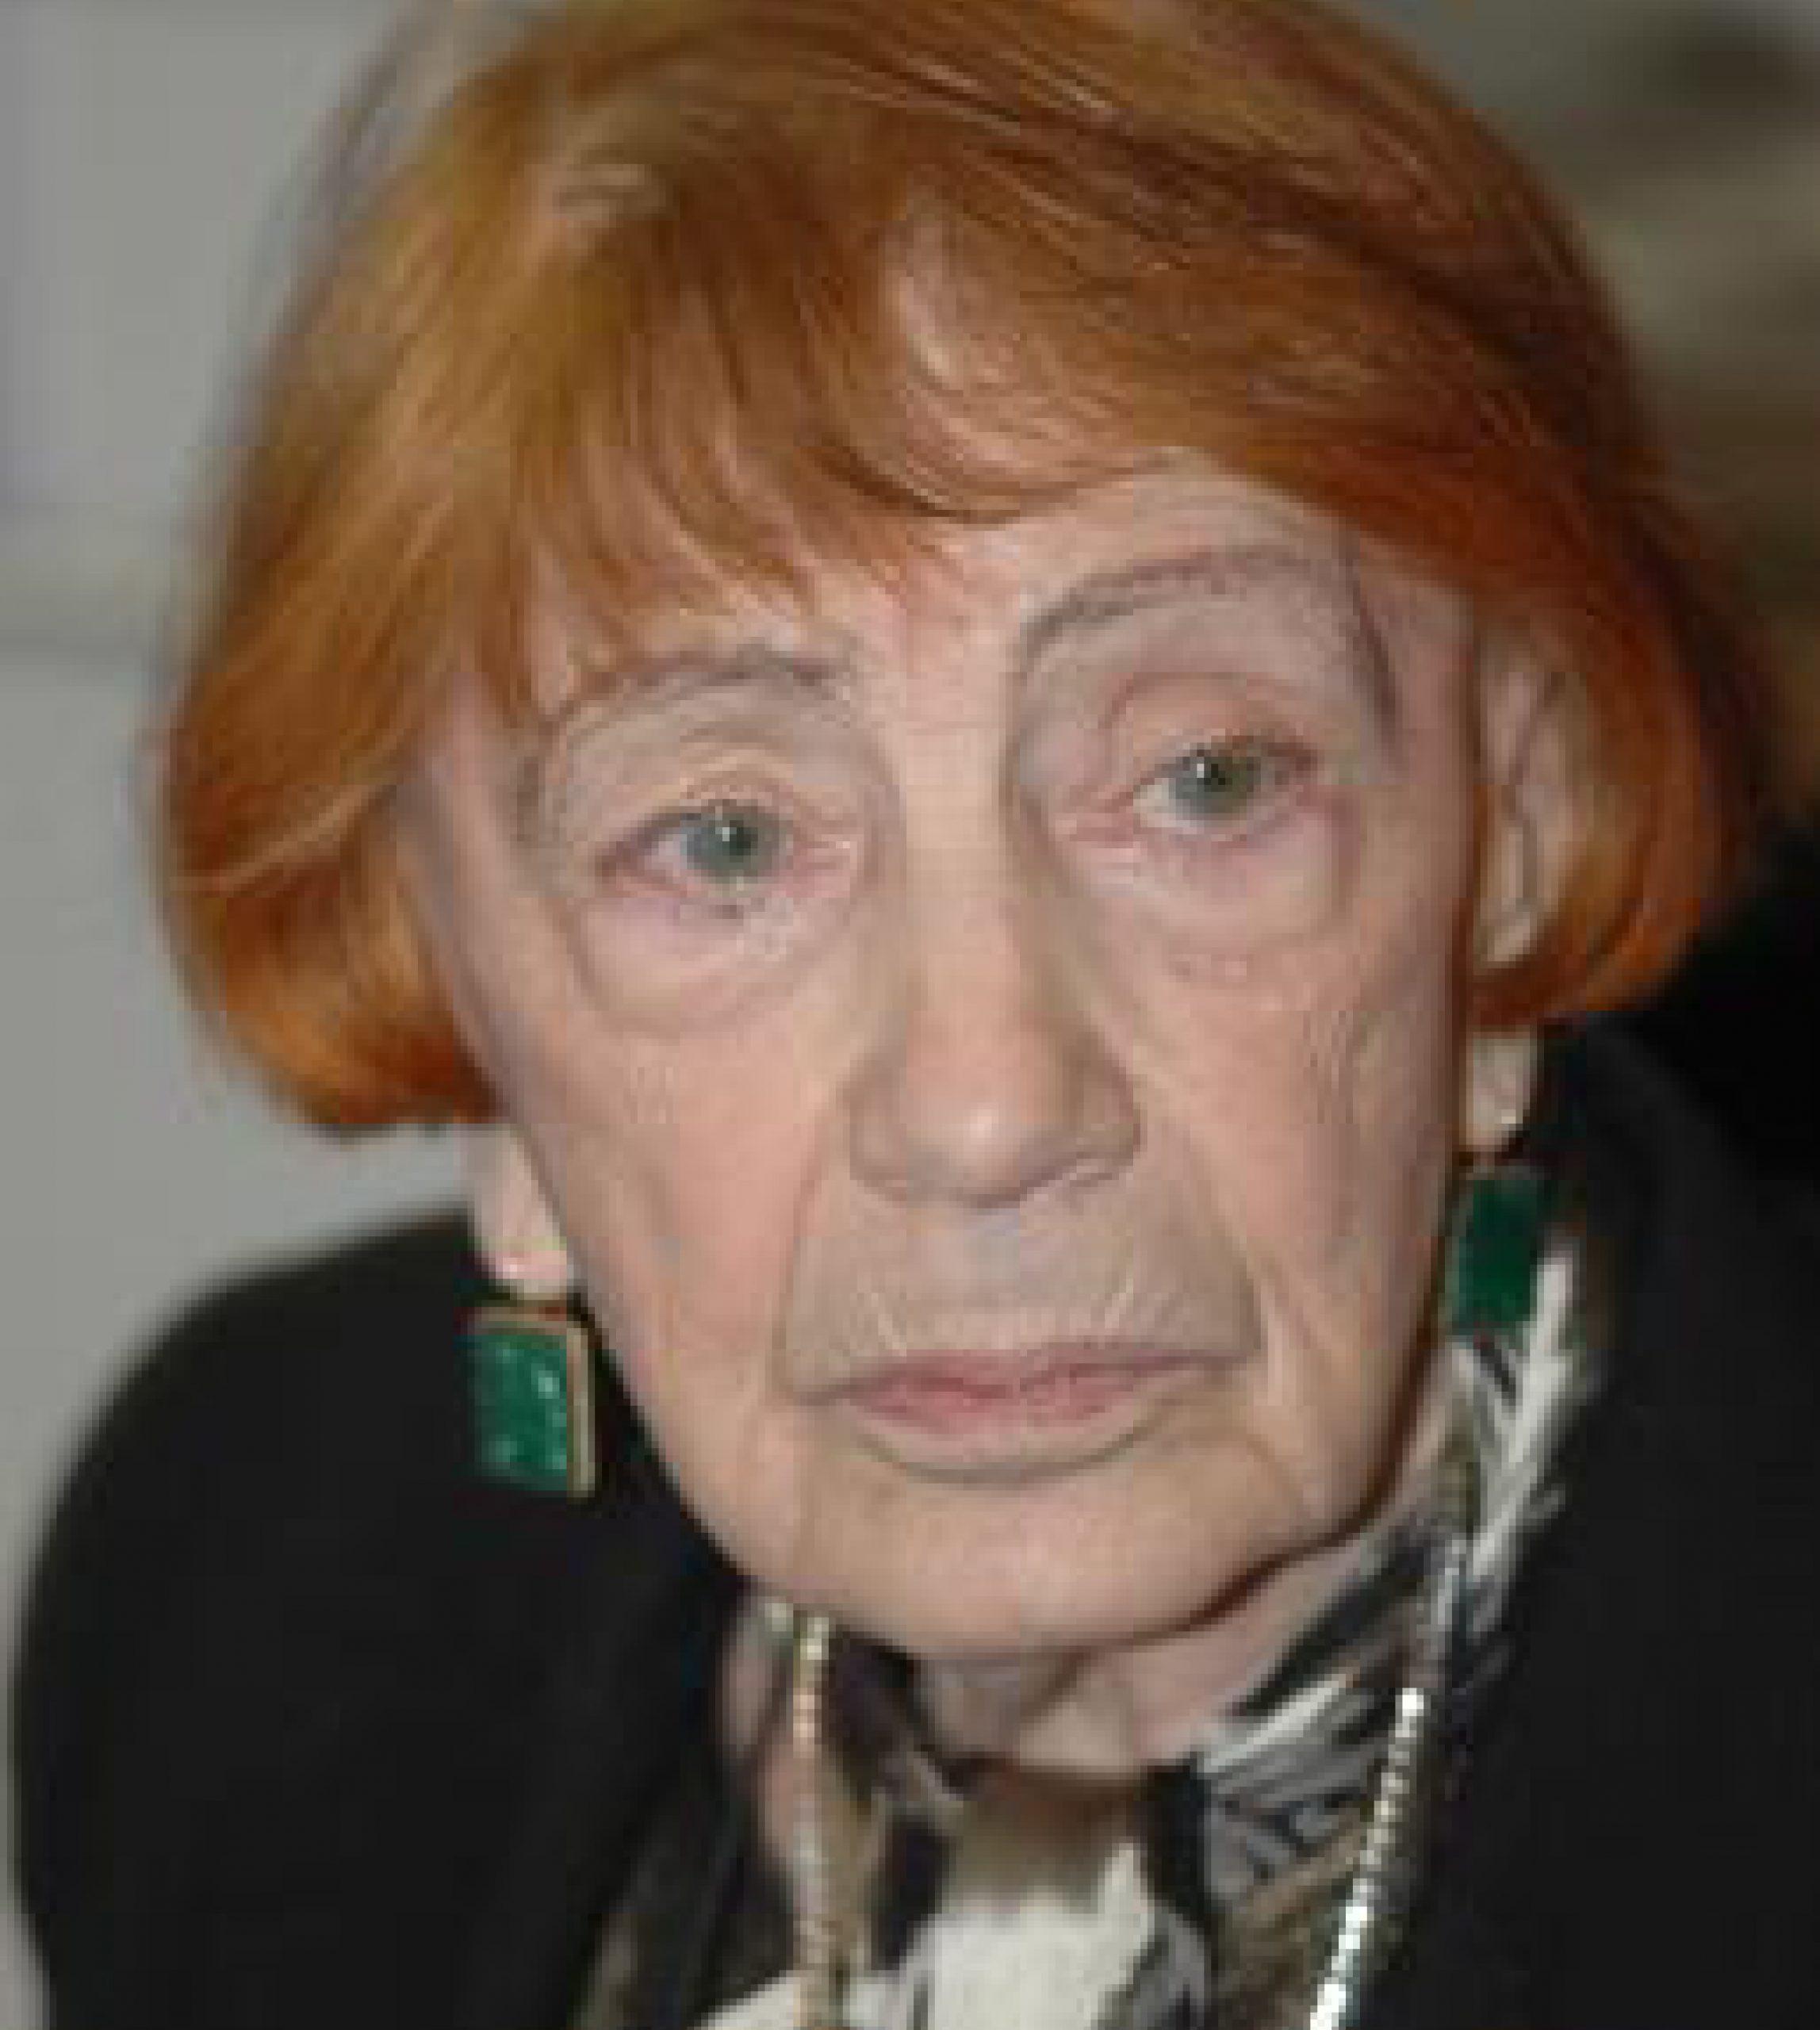 Maya Turovskaya